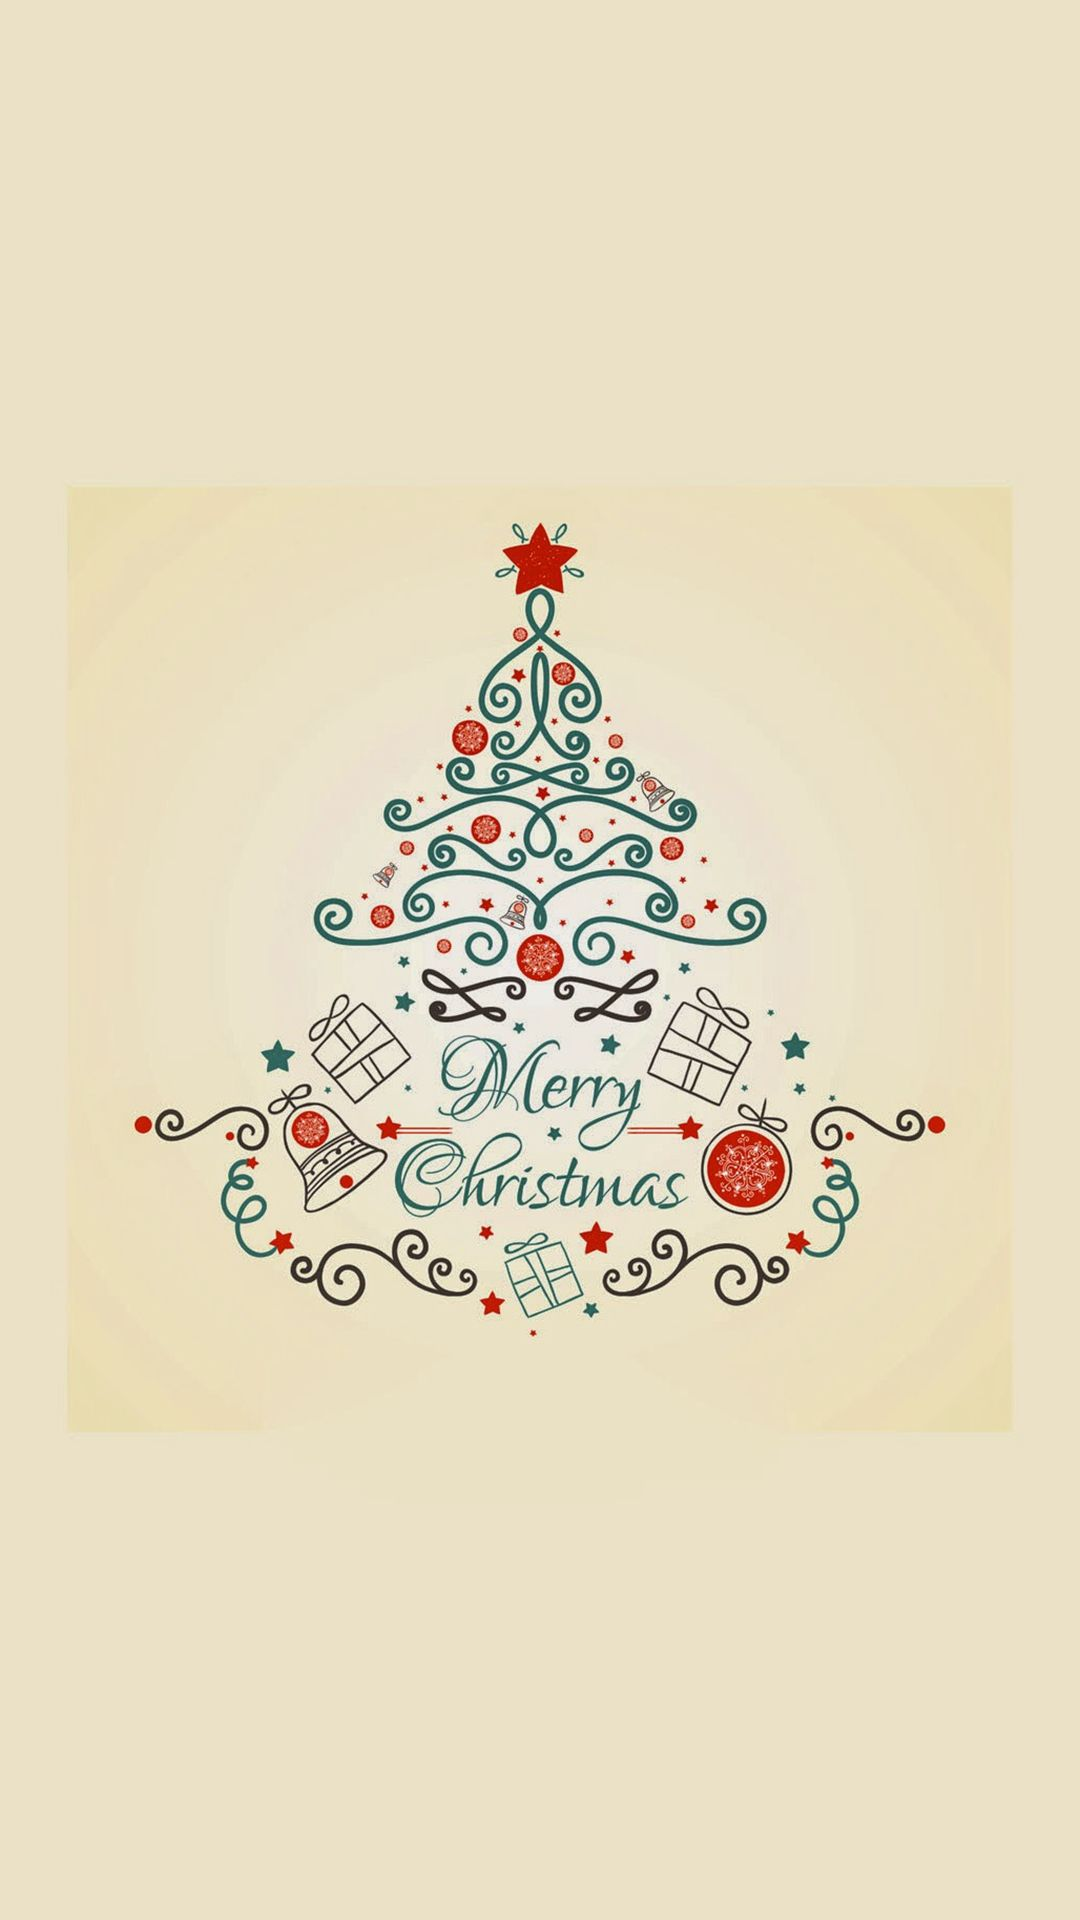 iPhone Wall: Christmas tjn | iPhone Walls: Christmas & HNY ...